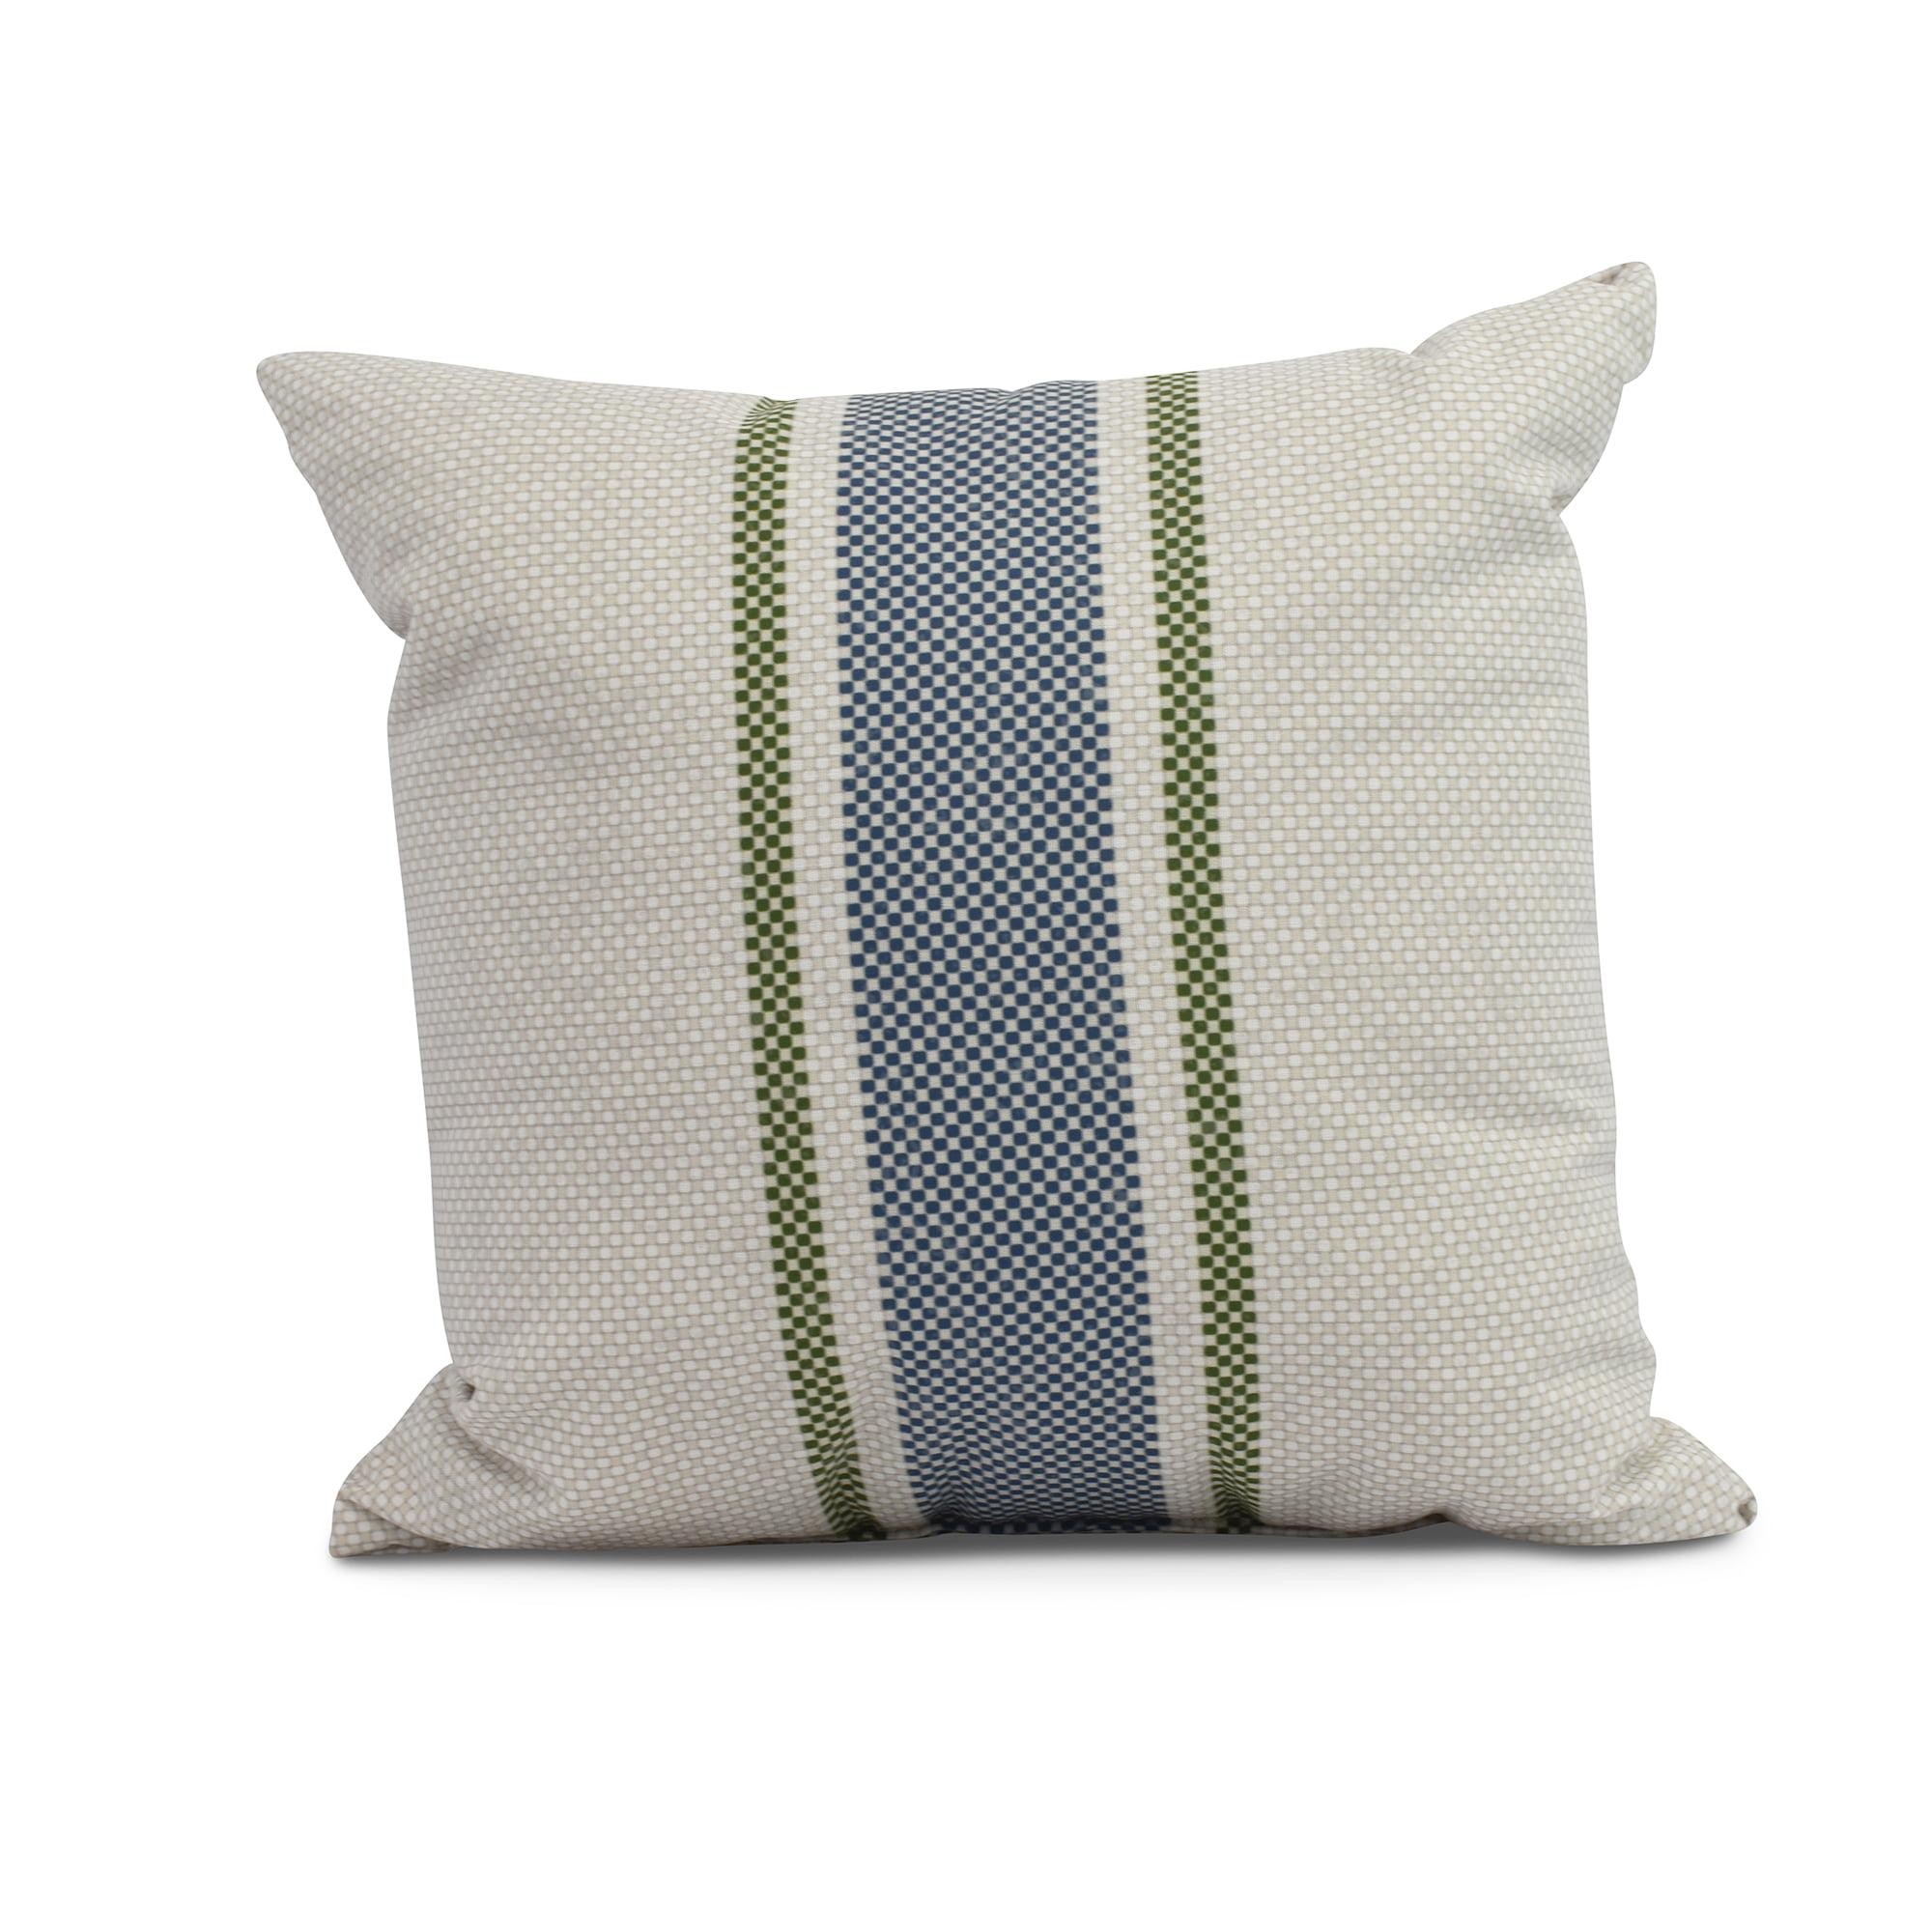 Simply Daisy, 20 x 20 inch,Grain Sack Decorative Pillow,Navy Blue